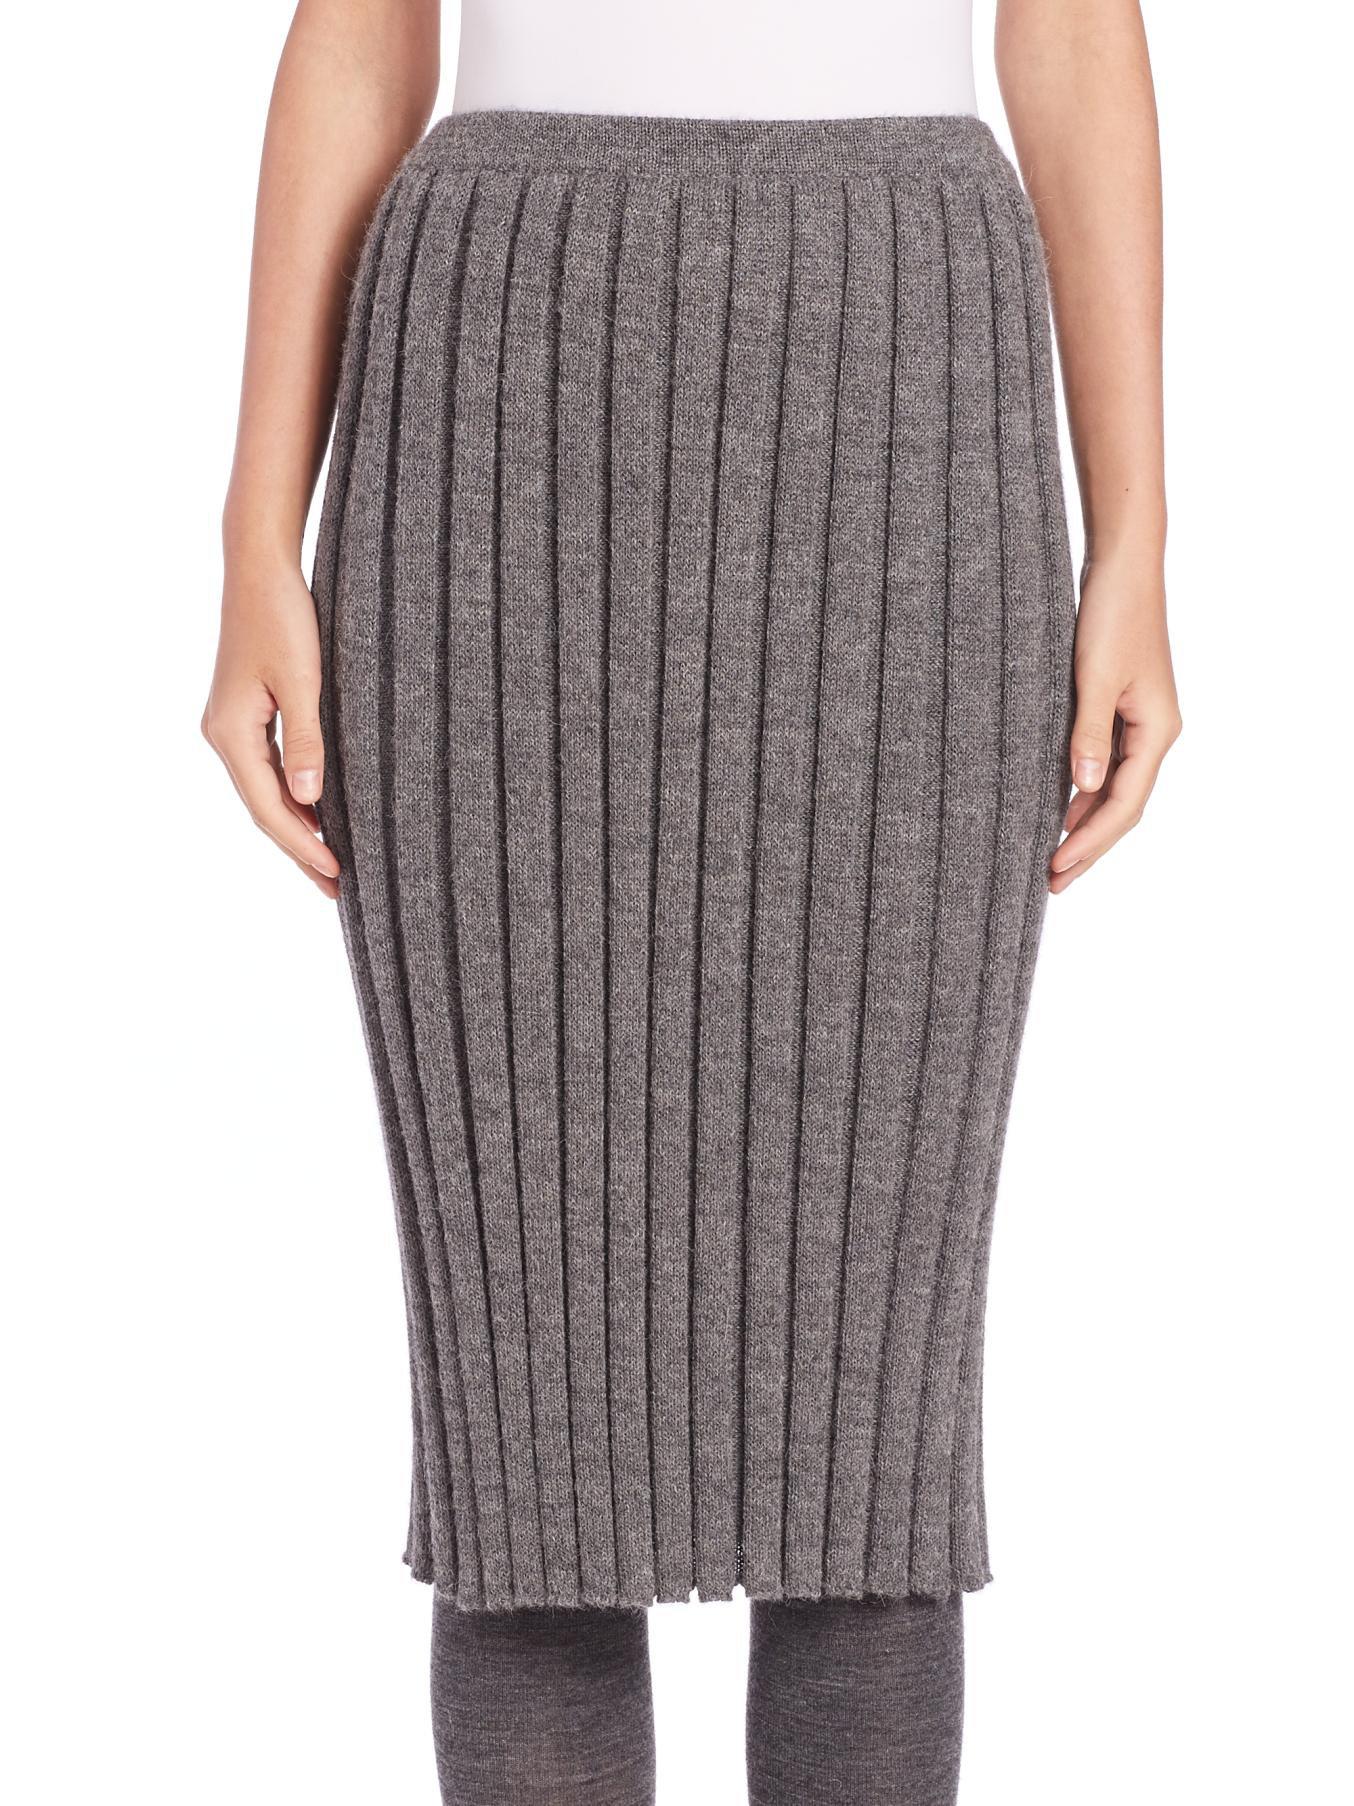 Detacher Rib-Knit Pencil Skirt in Gray (grey) | Lyst